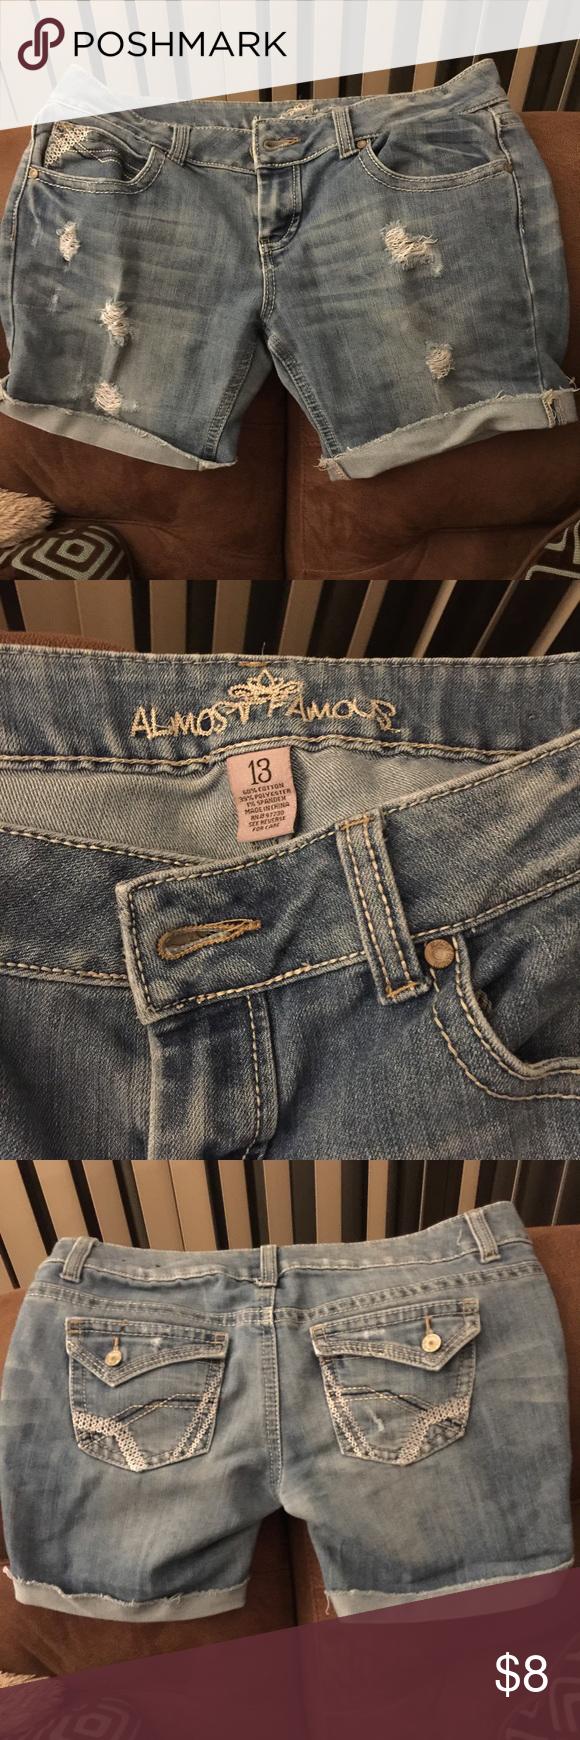 Almost famous juniors size 13 shorts Super cute distressed size 13 shorts (juniors) Almost Famous Shorts Jean Shorts